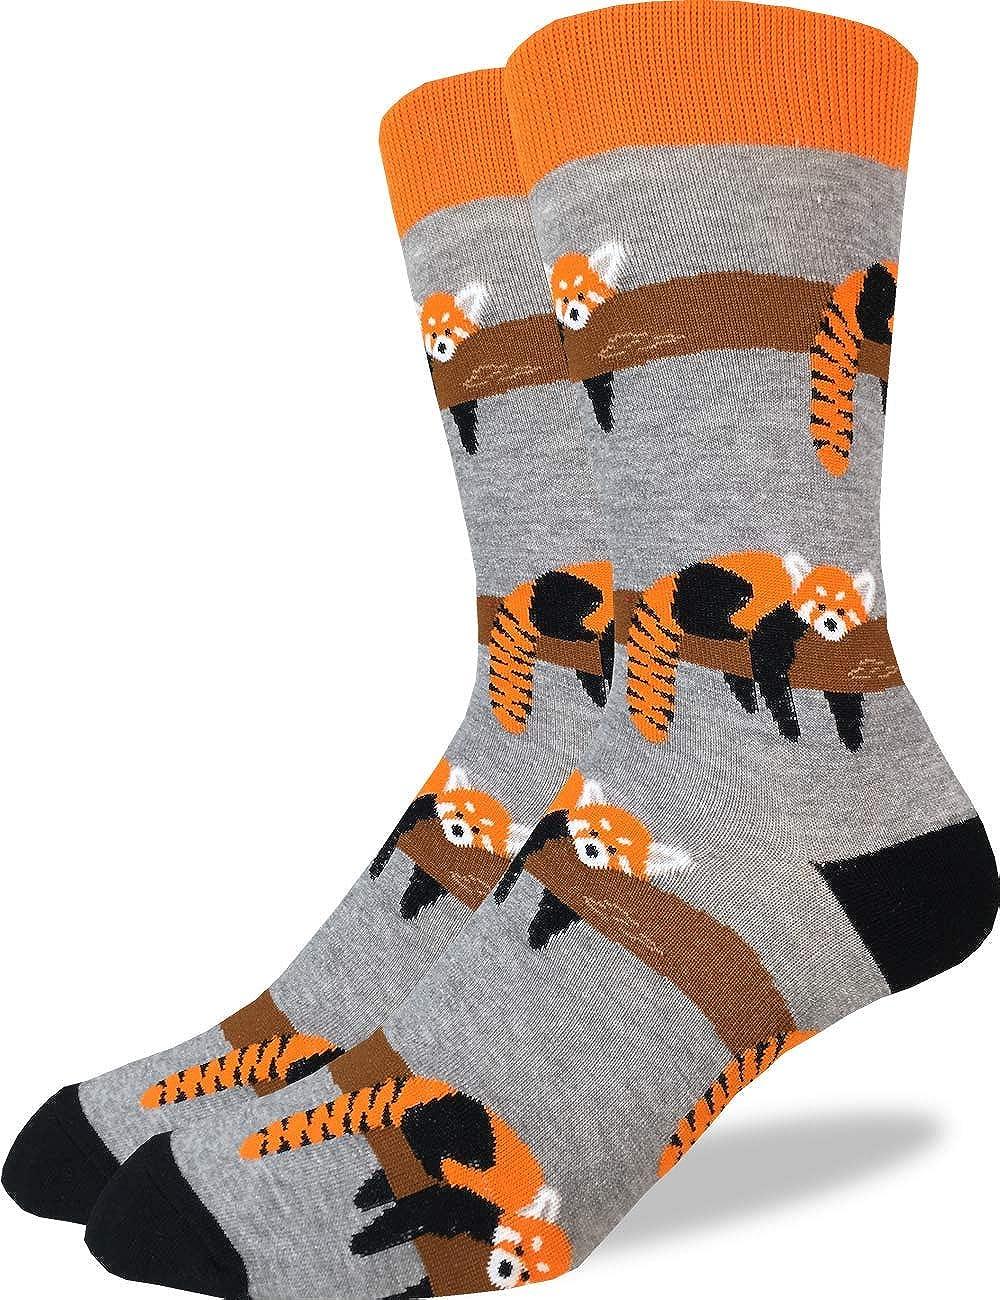 Good Luck Sock Mens Extra Large Corgi Sharks Socks Big /& Tall Shoe Size 13-17